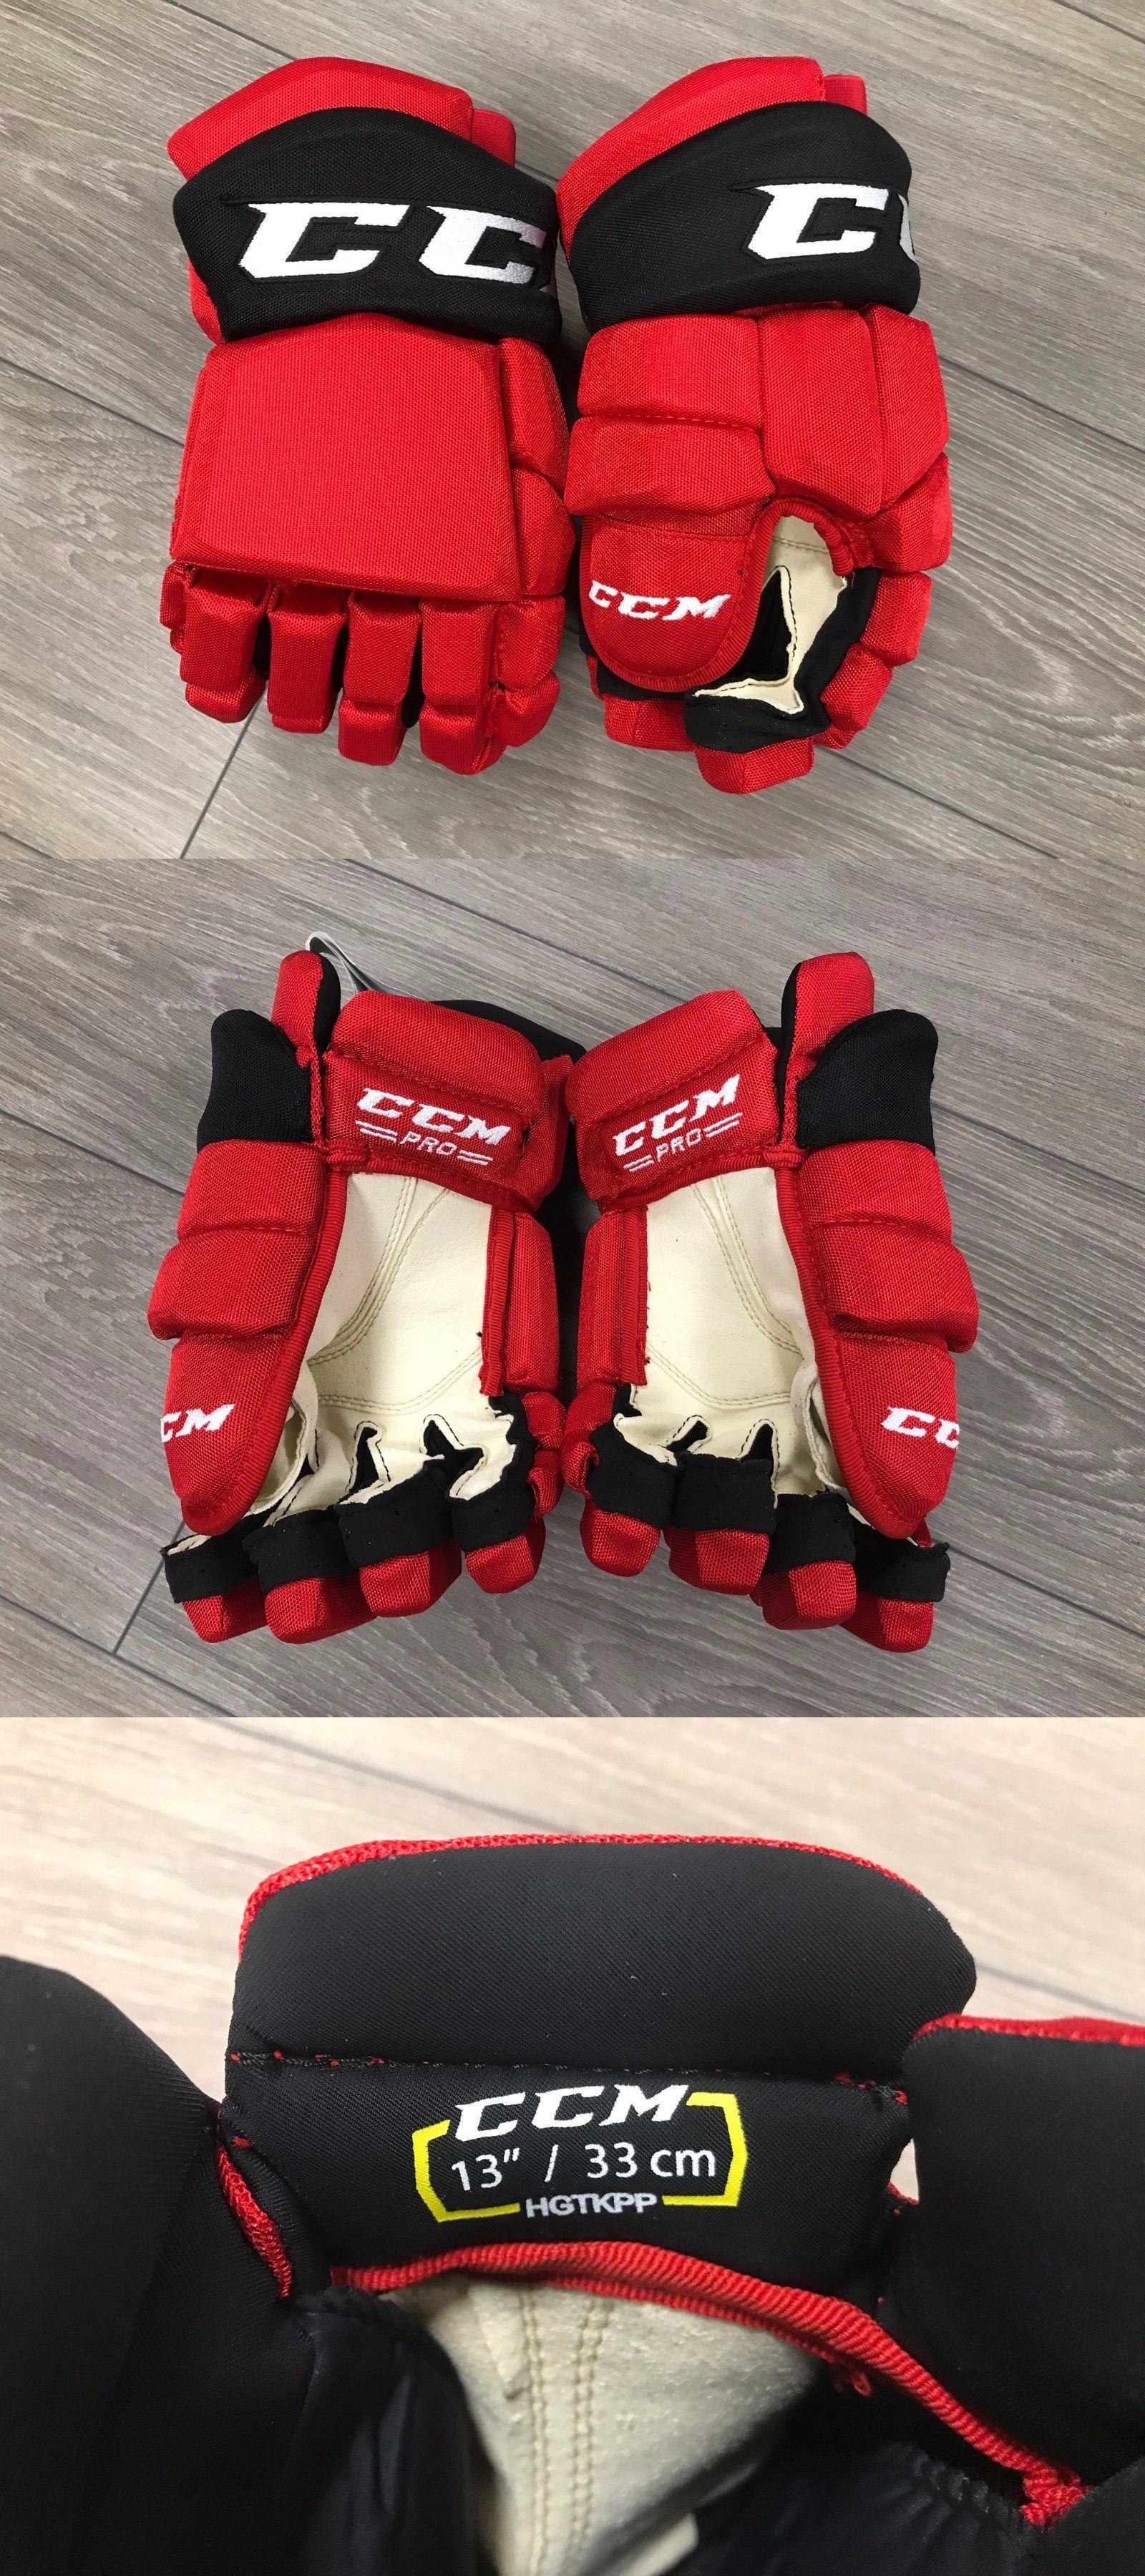 Ccm Tacks New Jersey Devils Nhl Pro Stock Return Hockey Player Gloves 13 -   BUY IT NOW ONLY   209 on eBay! 451f617f6d0